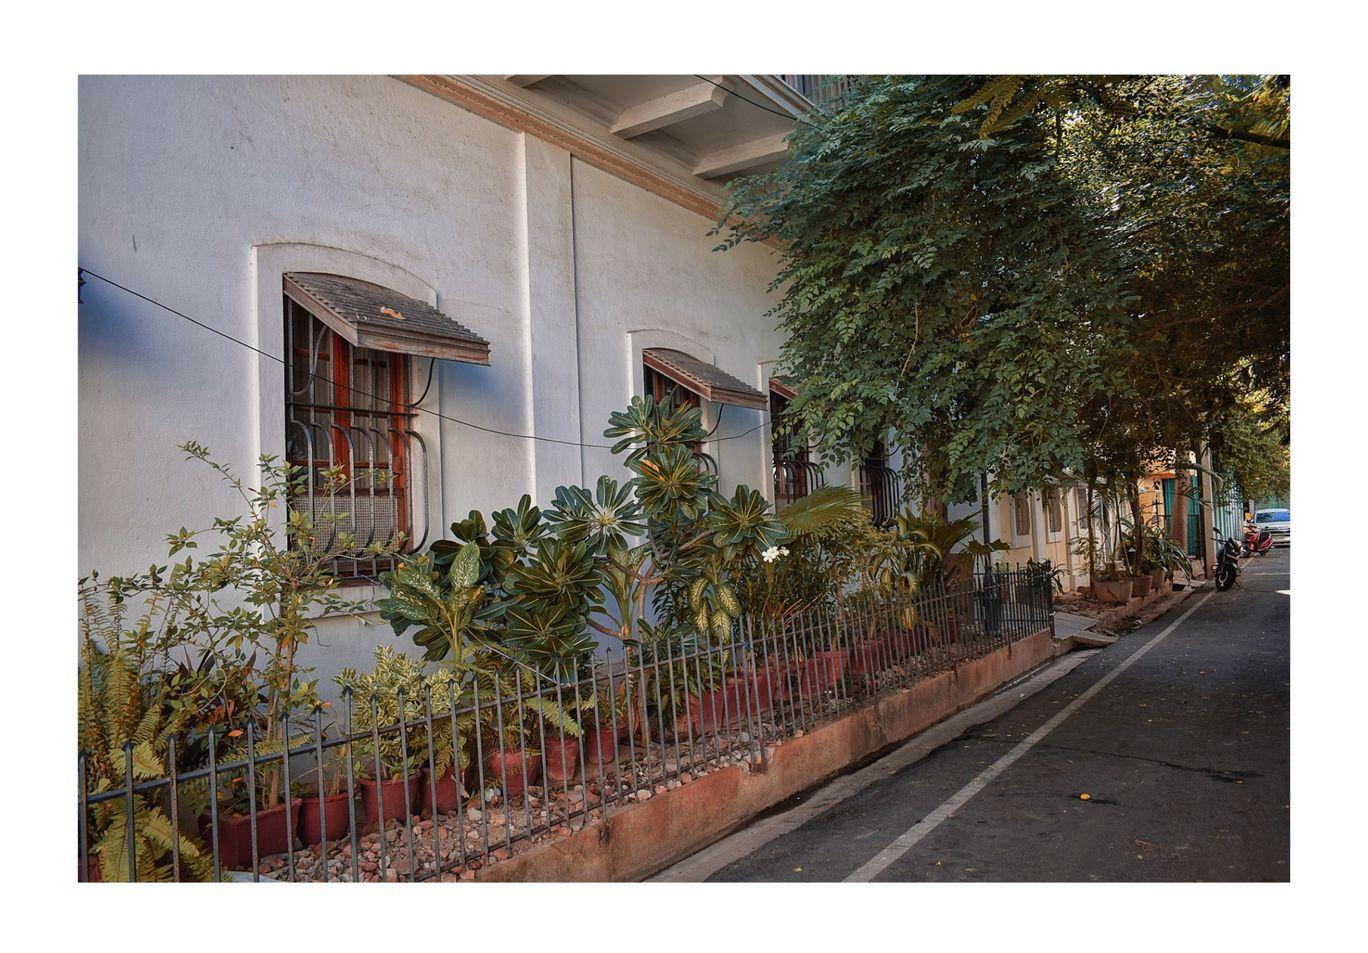 Photo of Pondicherry By Aarti Deshpande